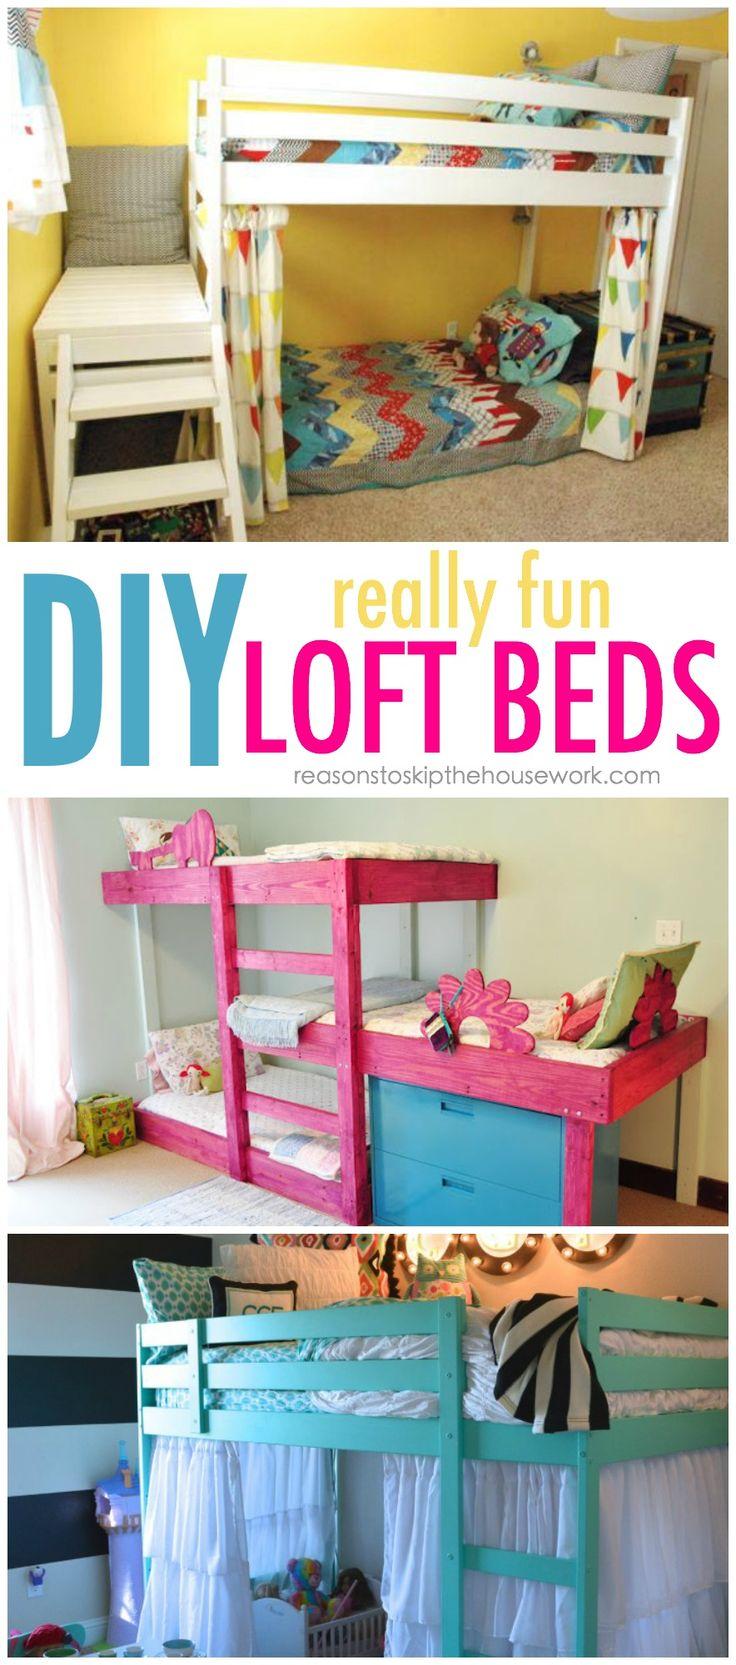 Building A Loft Bed Best 25 Build A Loft Bed Ideas On Pinterest Boys Loft Beds